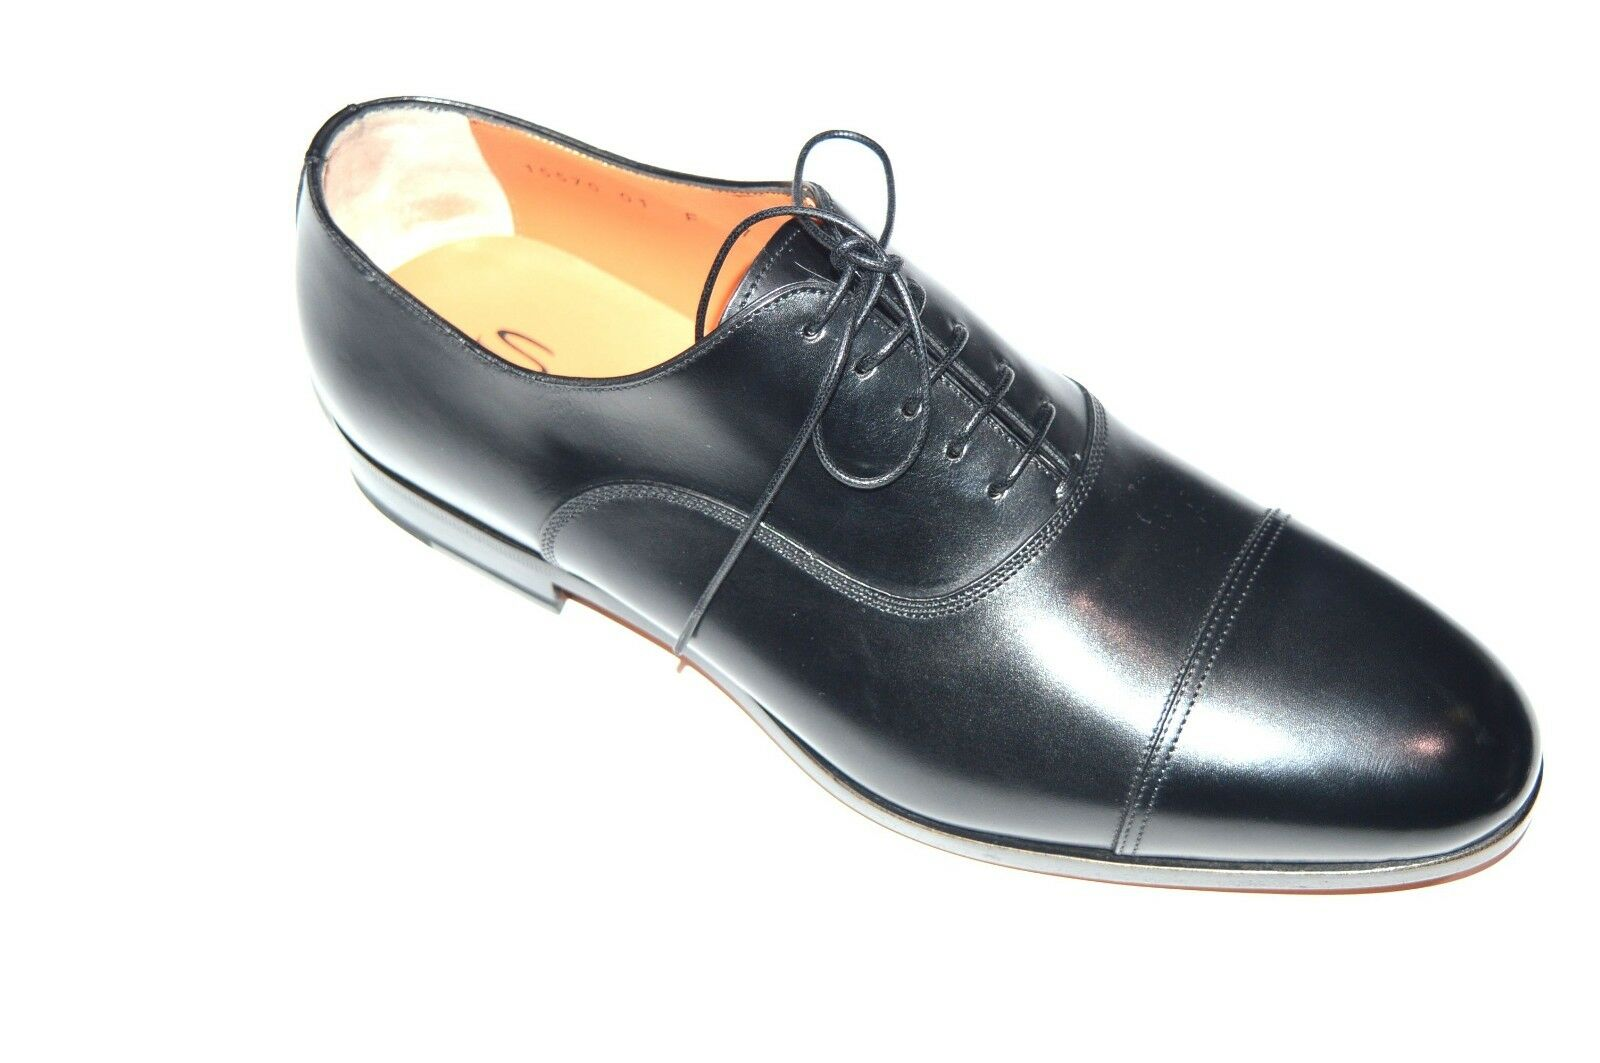 Lugz Nubuck Boots Pathway Mid Black Nubuck Lugz Leather Shoes Size 6.5 54bc12